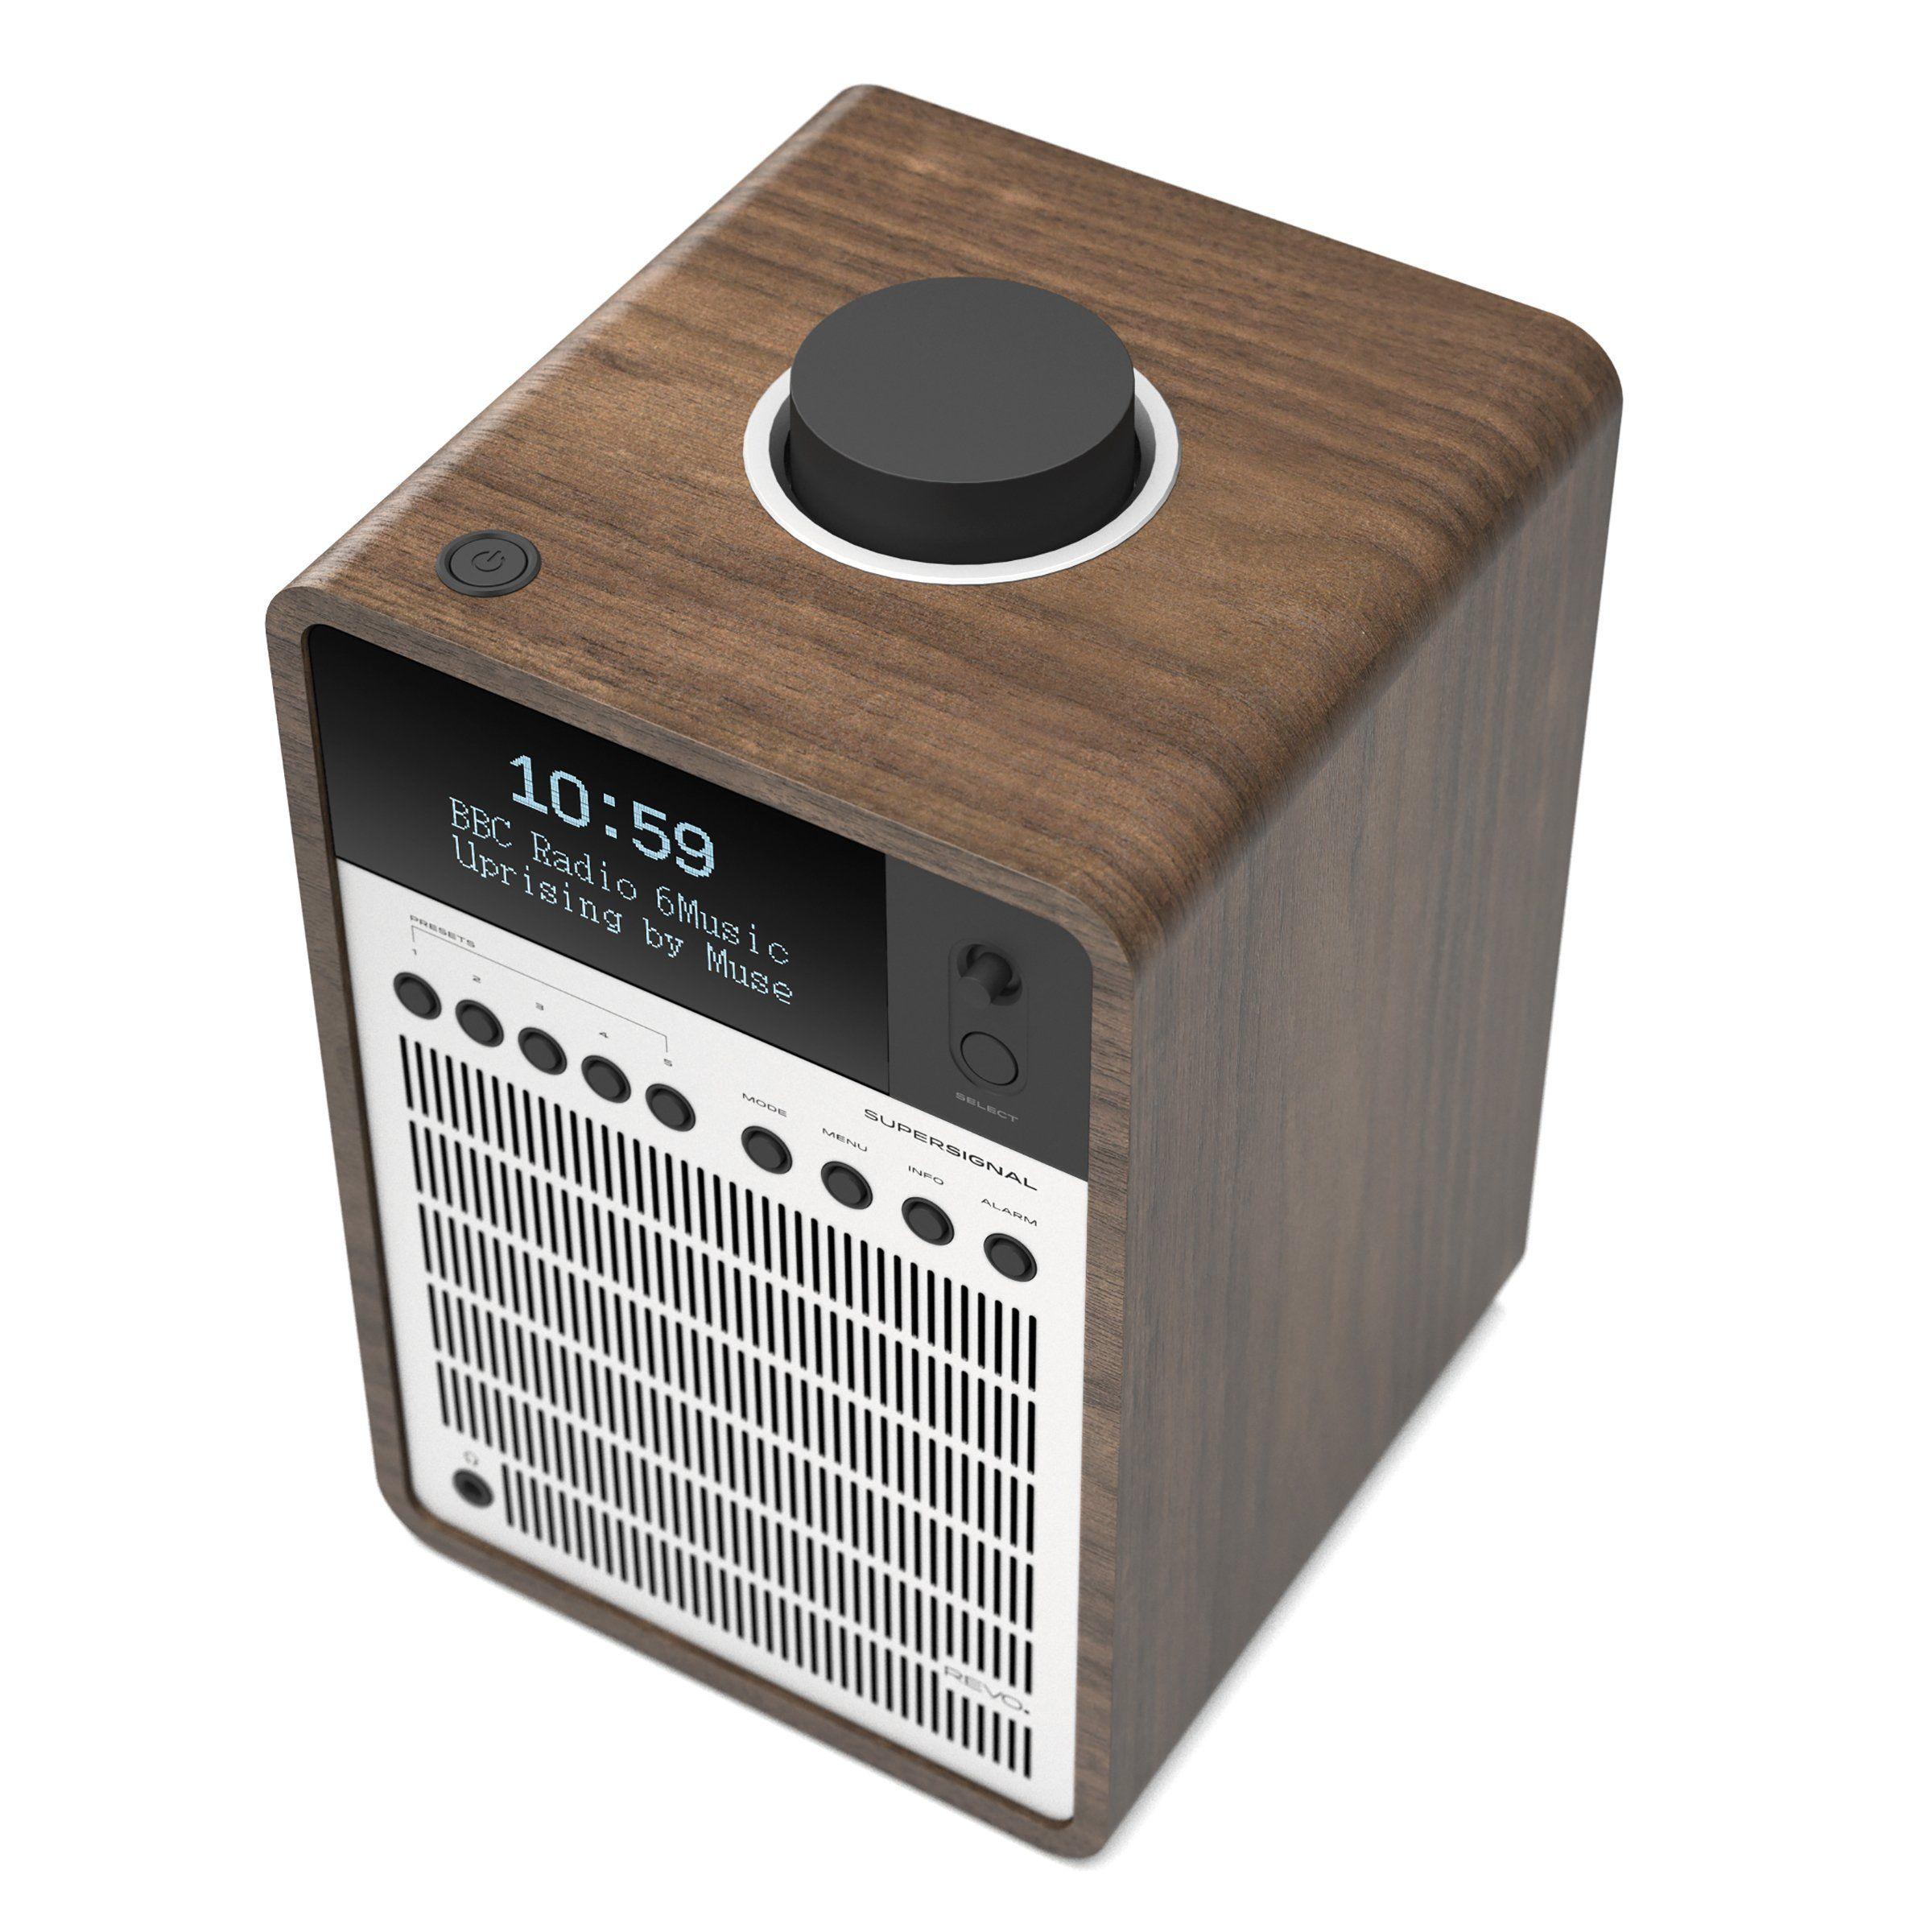 Revo SuperSignal Radio / Connected Speaker - Walnut / Silver